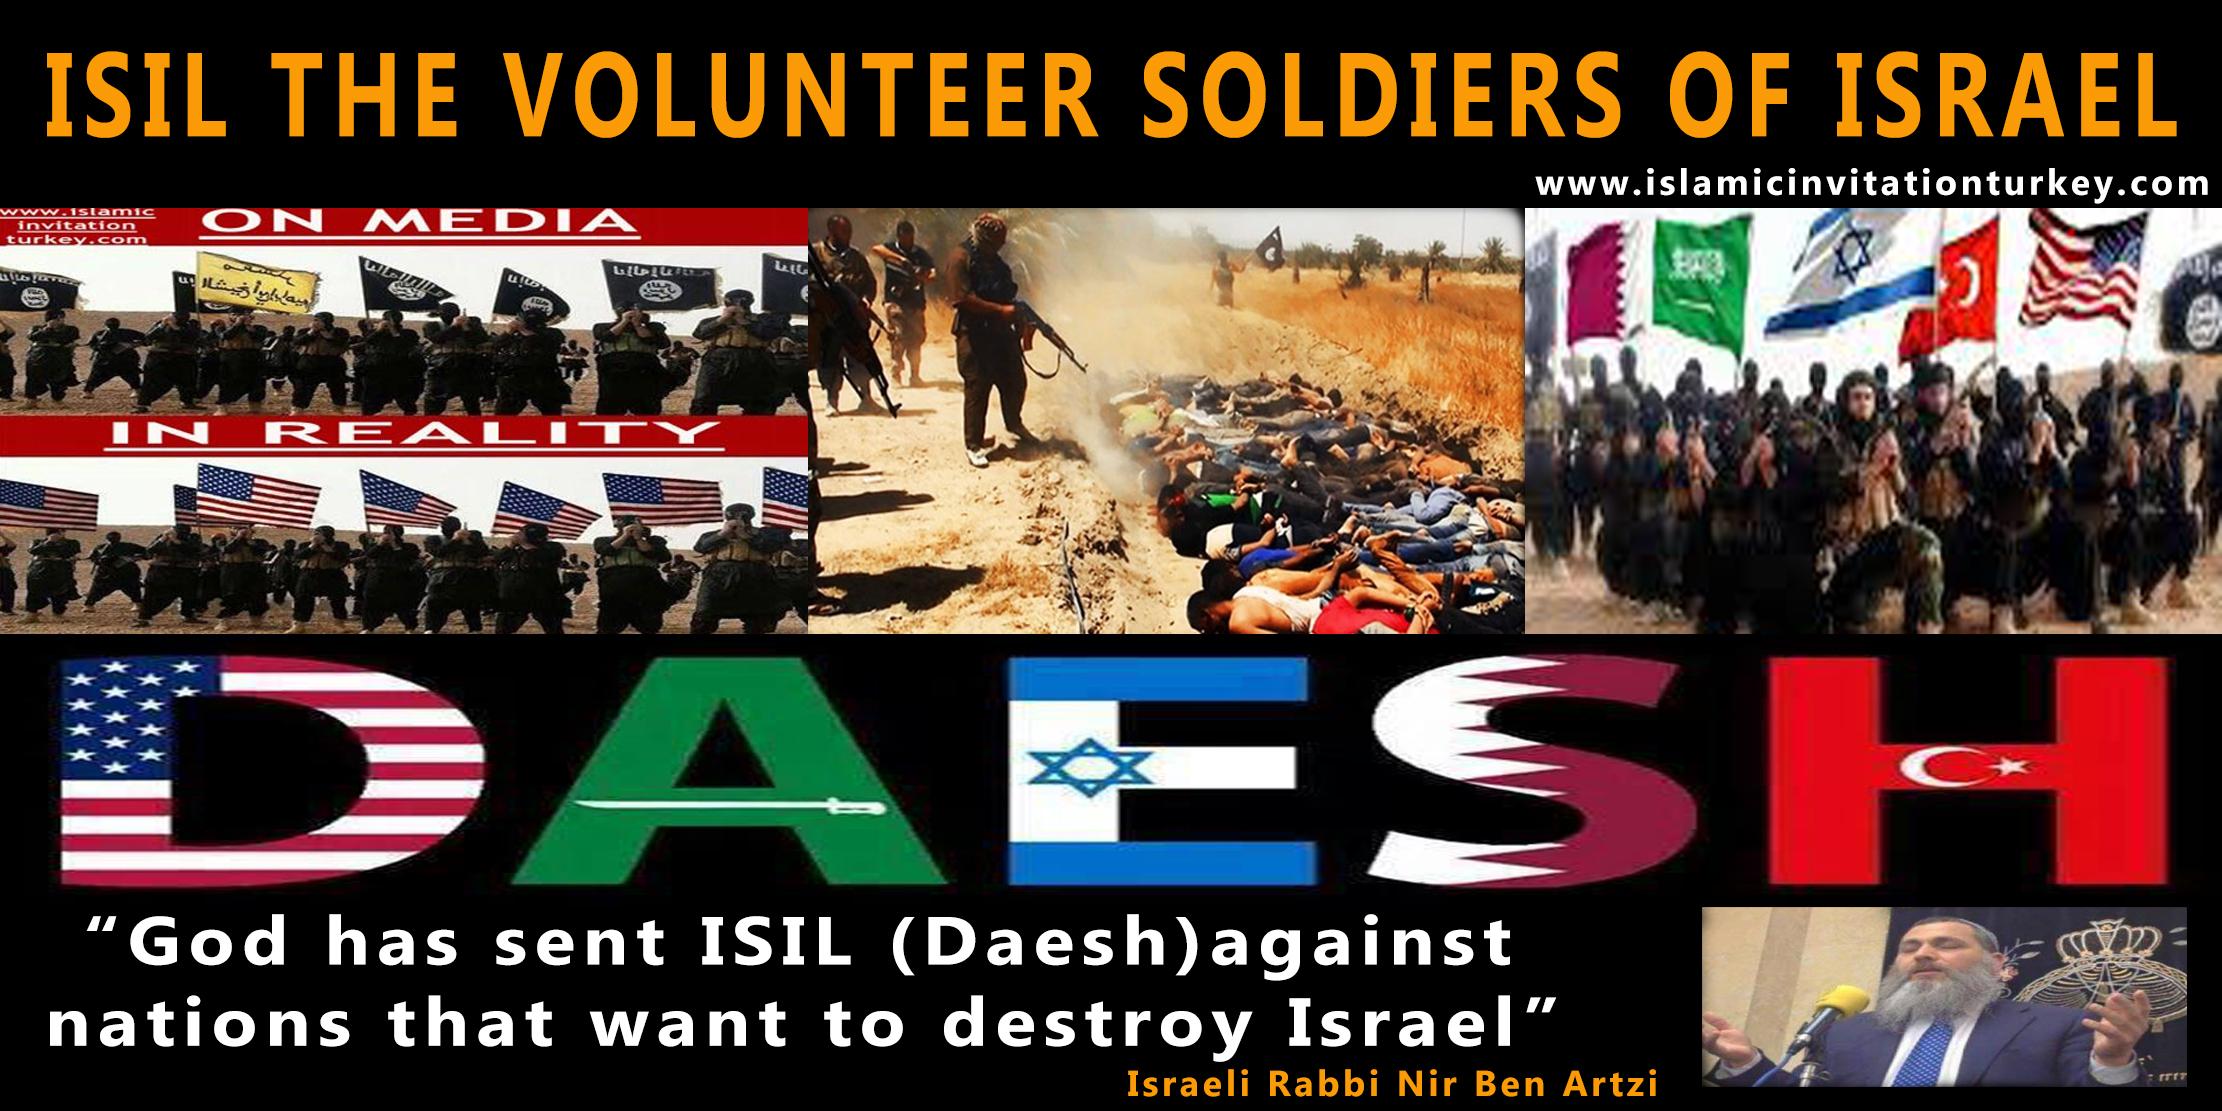 daesh and israel